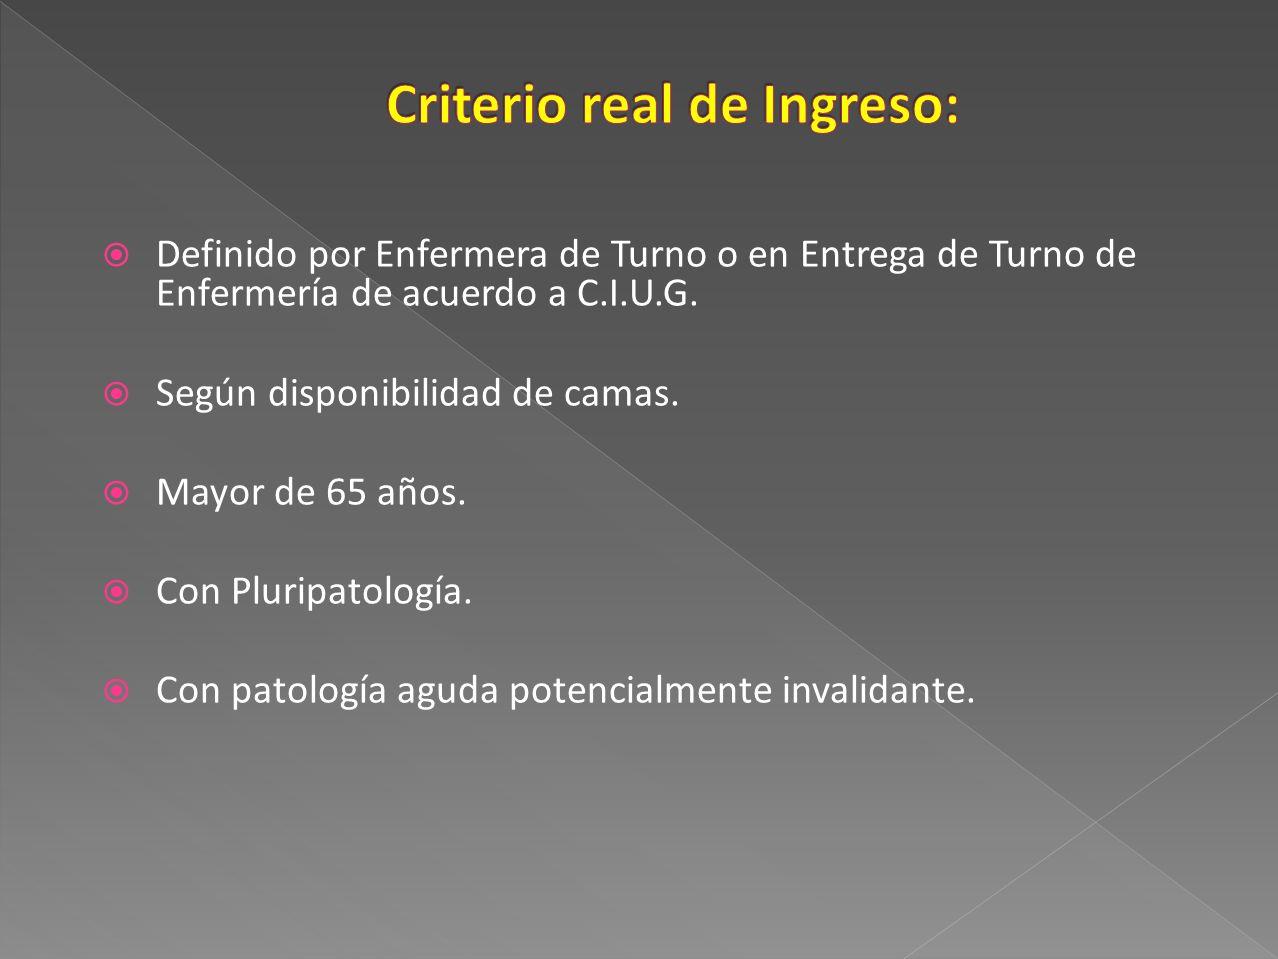 Criterio real de Ingreso: